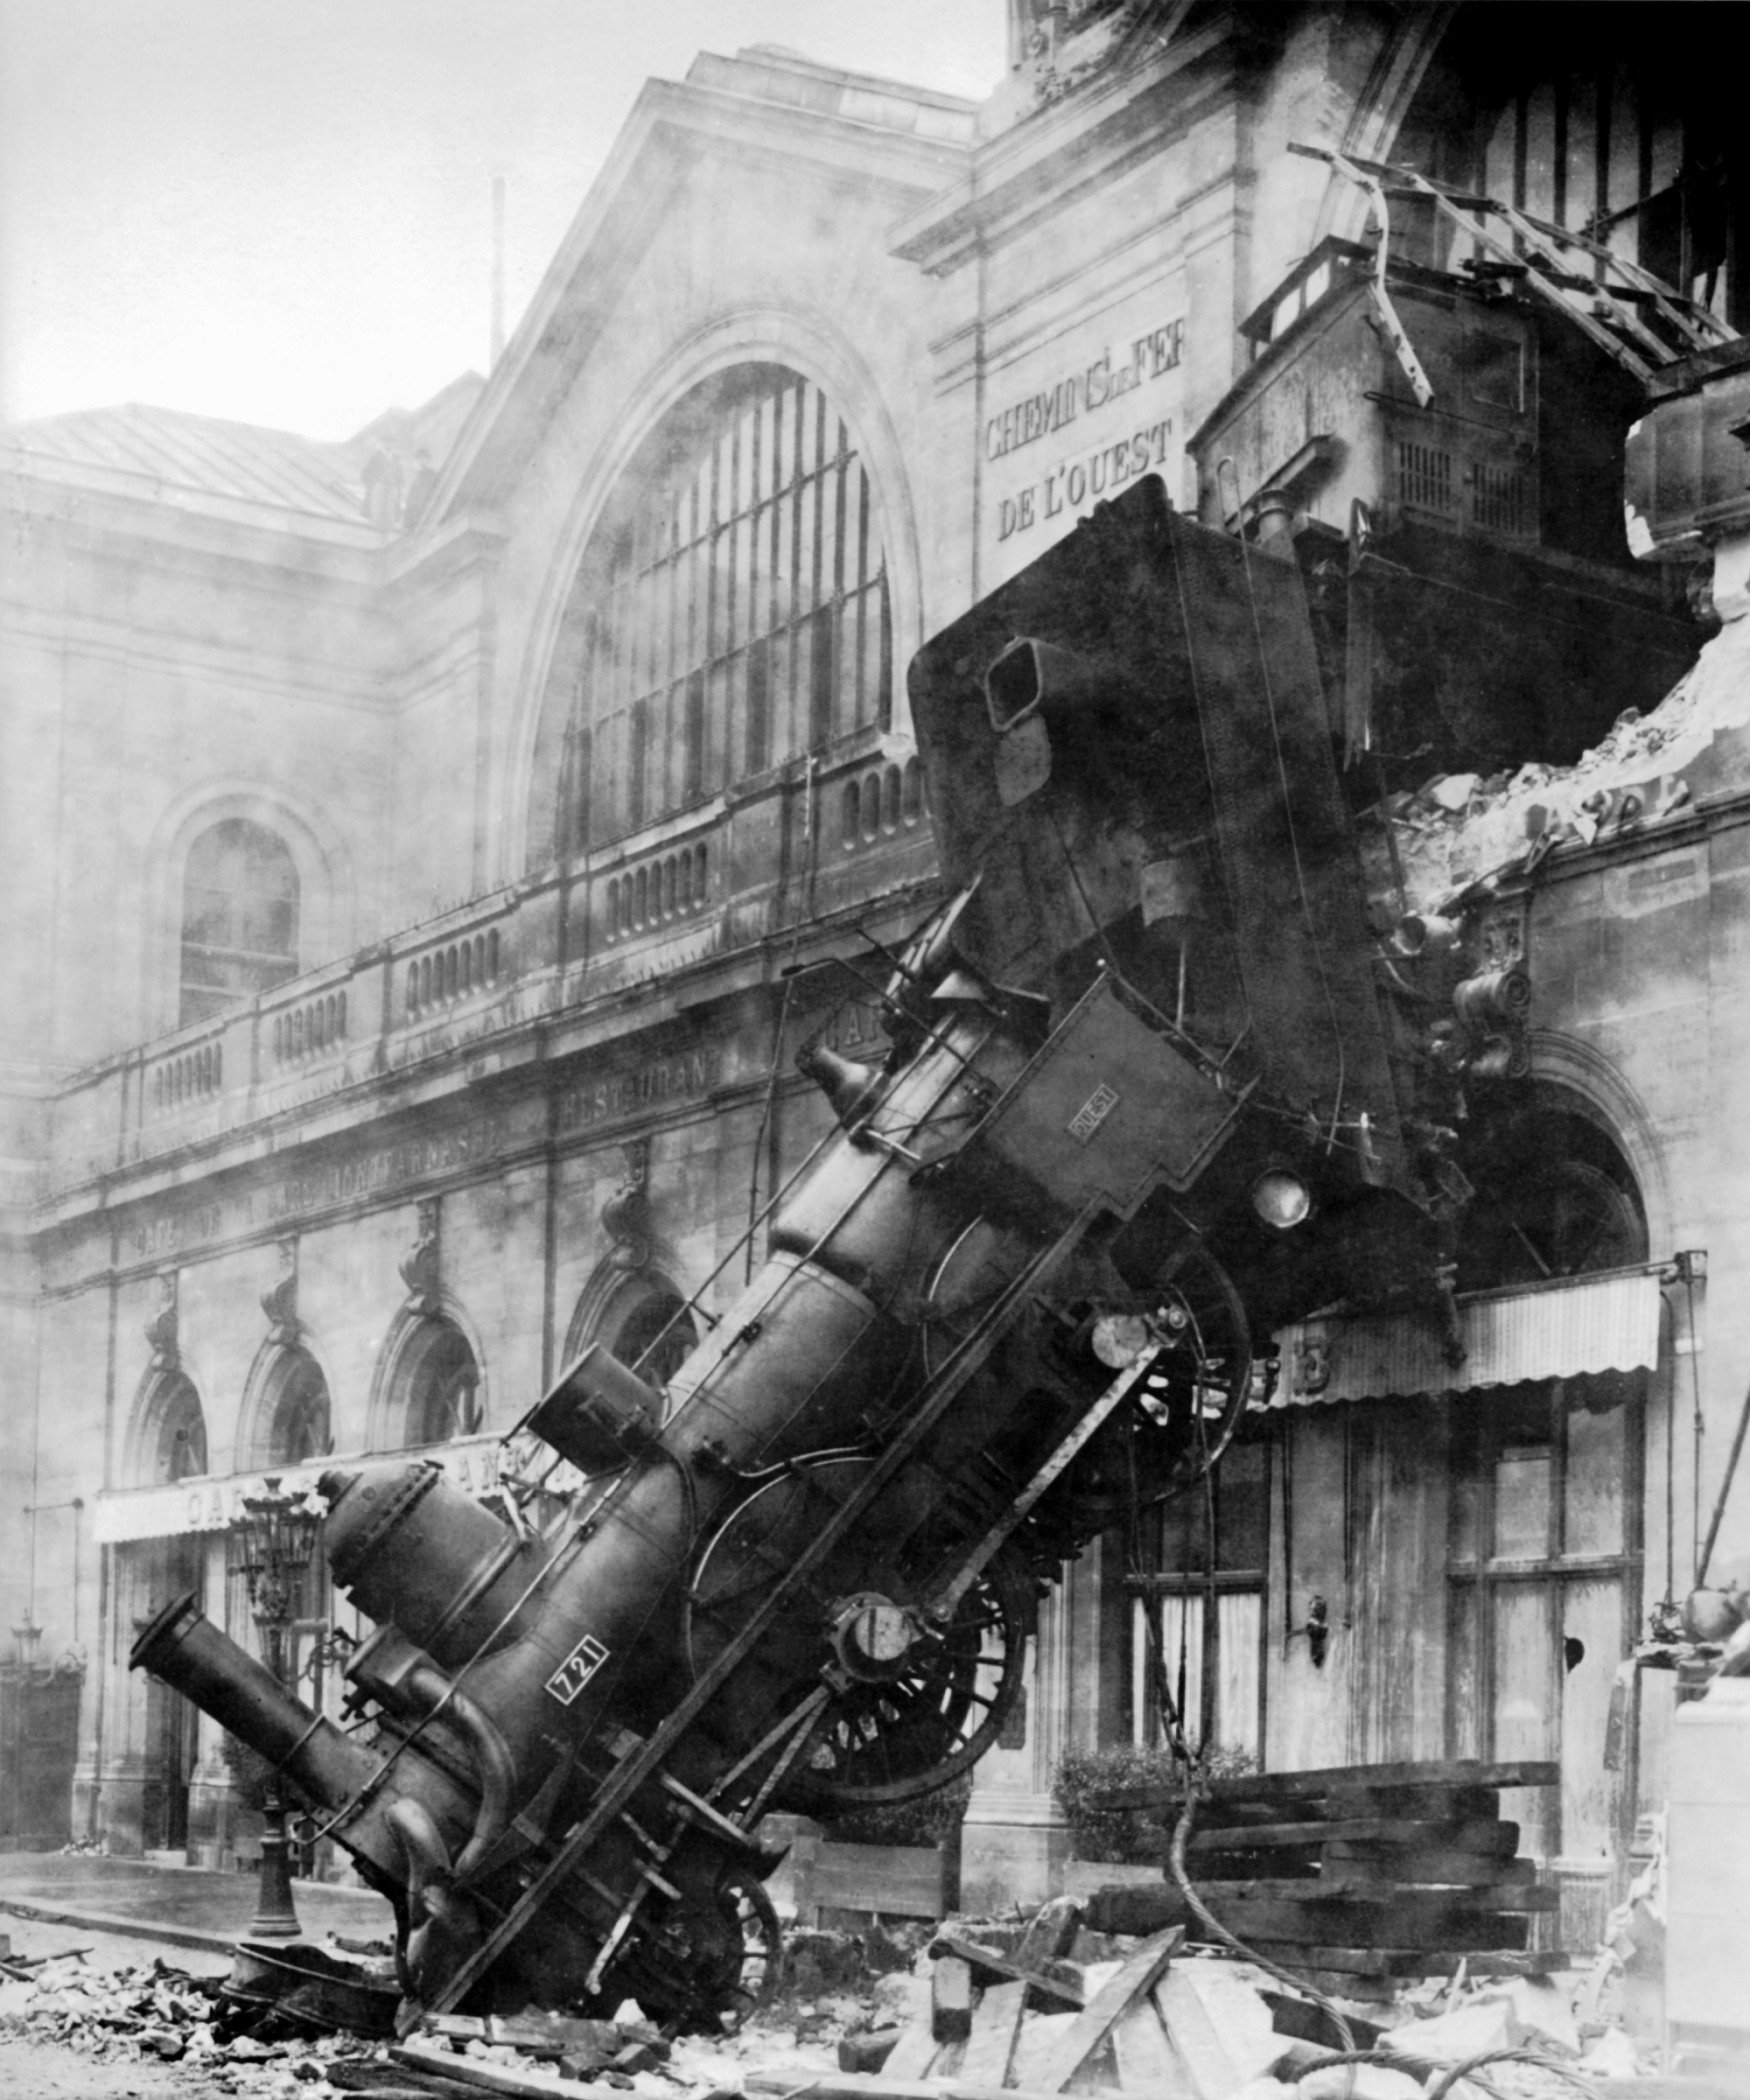 Train wreck at Montparnasse, Paris, 1895